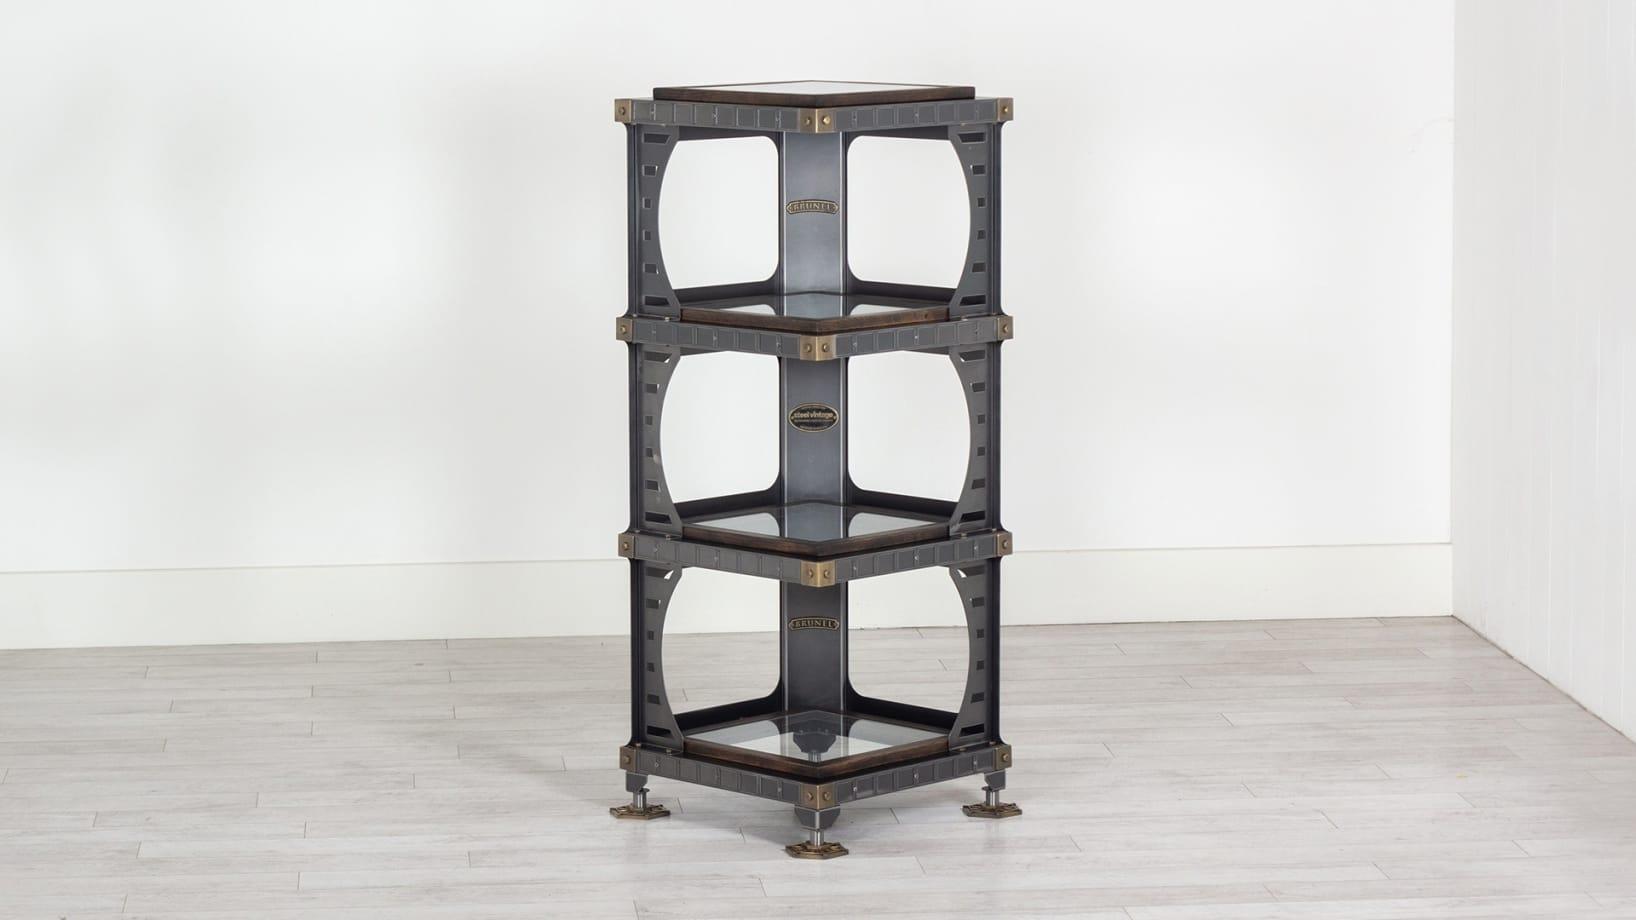 Steel Vintage Brunel Display Stand